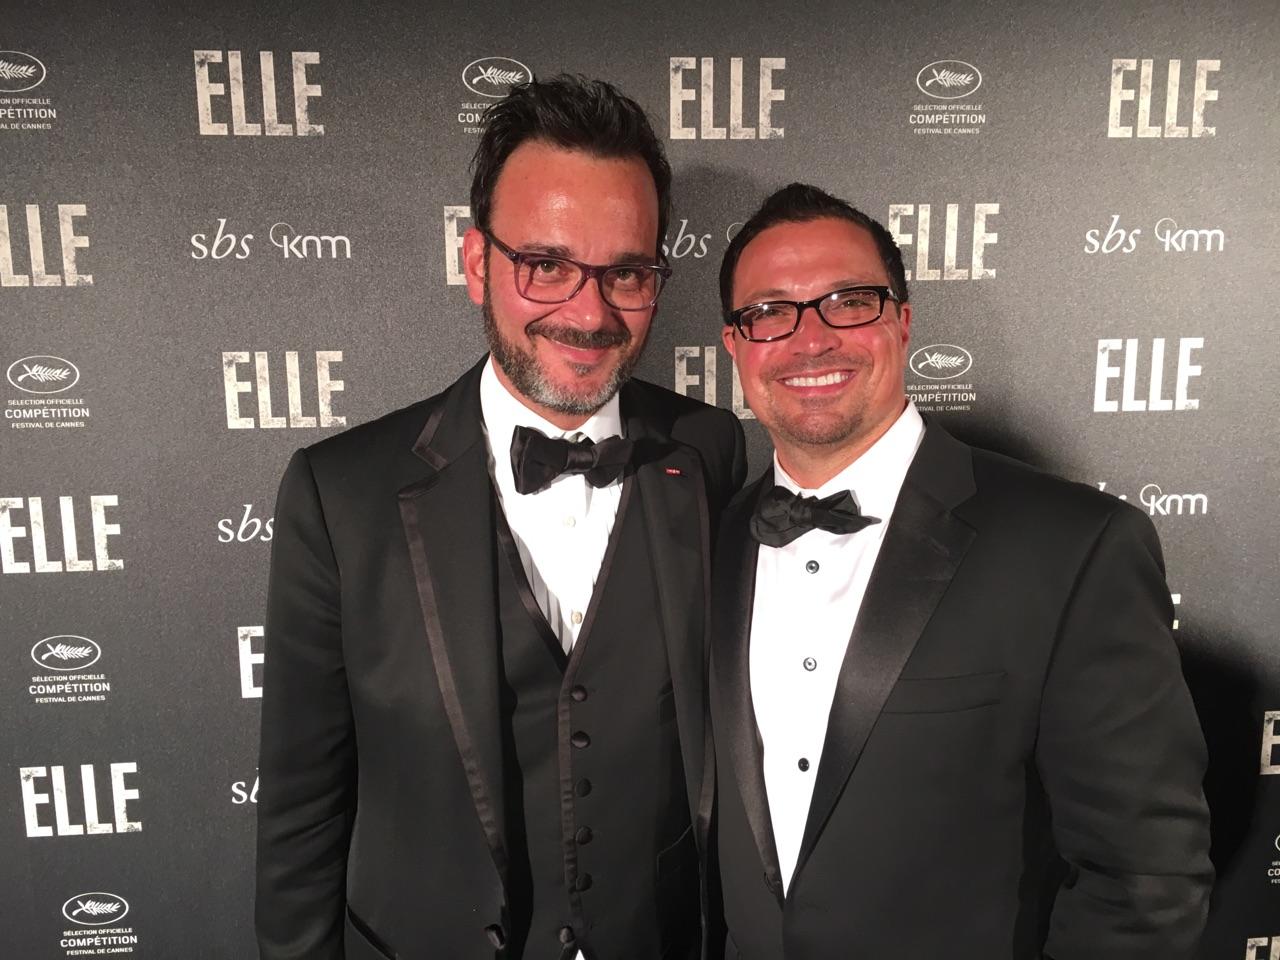 Stage 32er Michel Merkt Wins the Golden Globe for Best Foreign Film